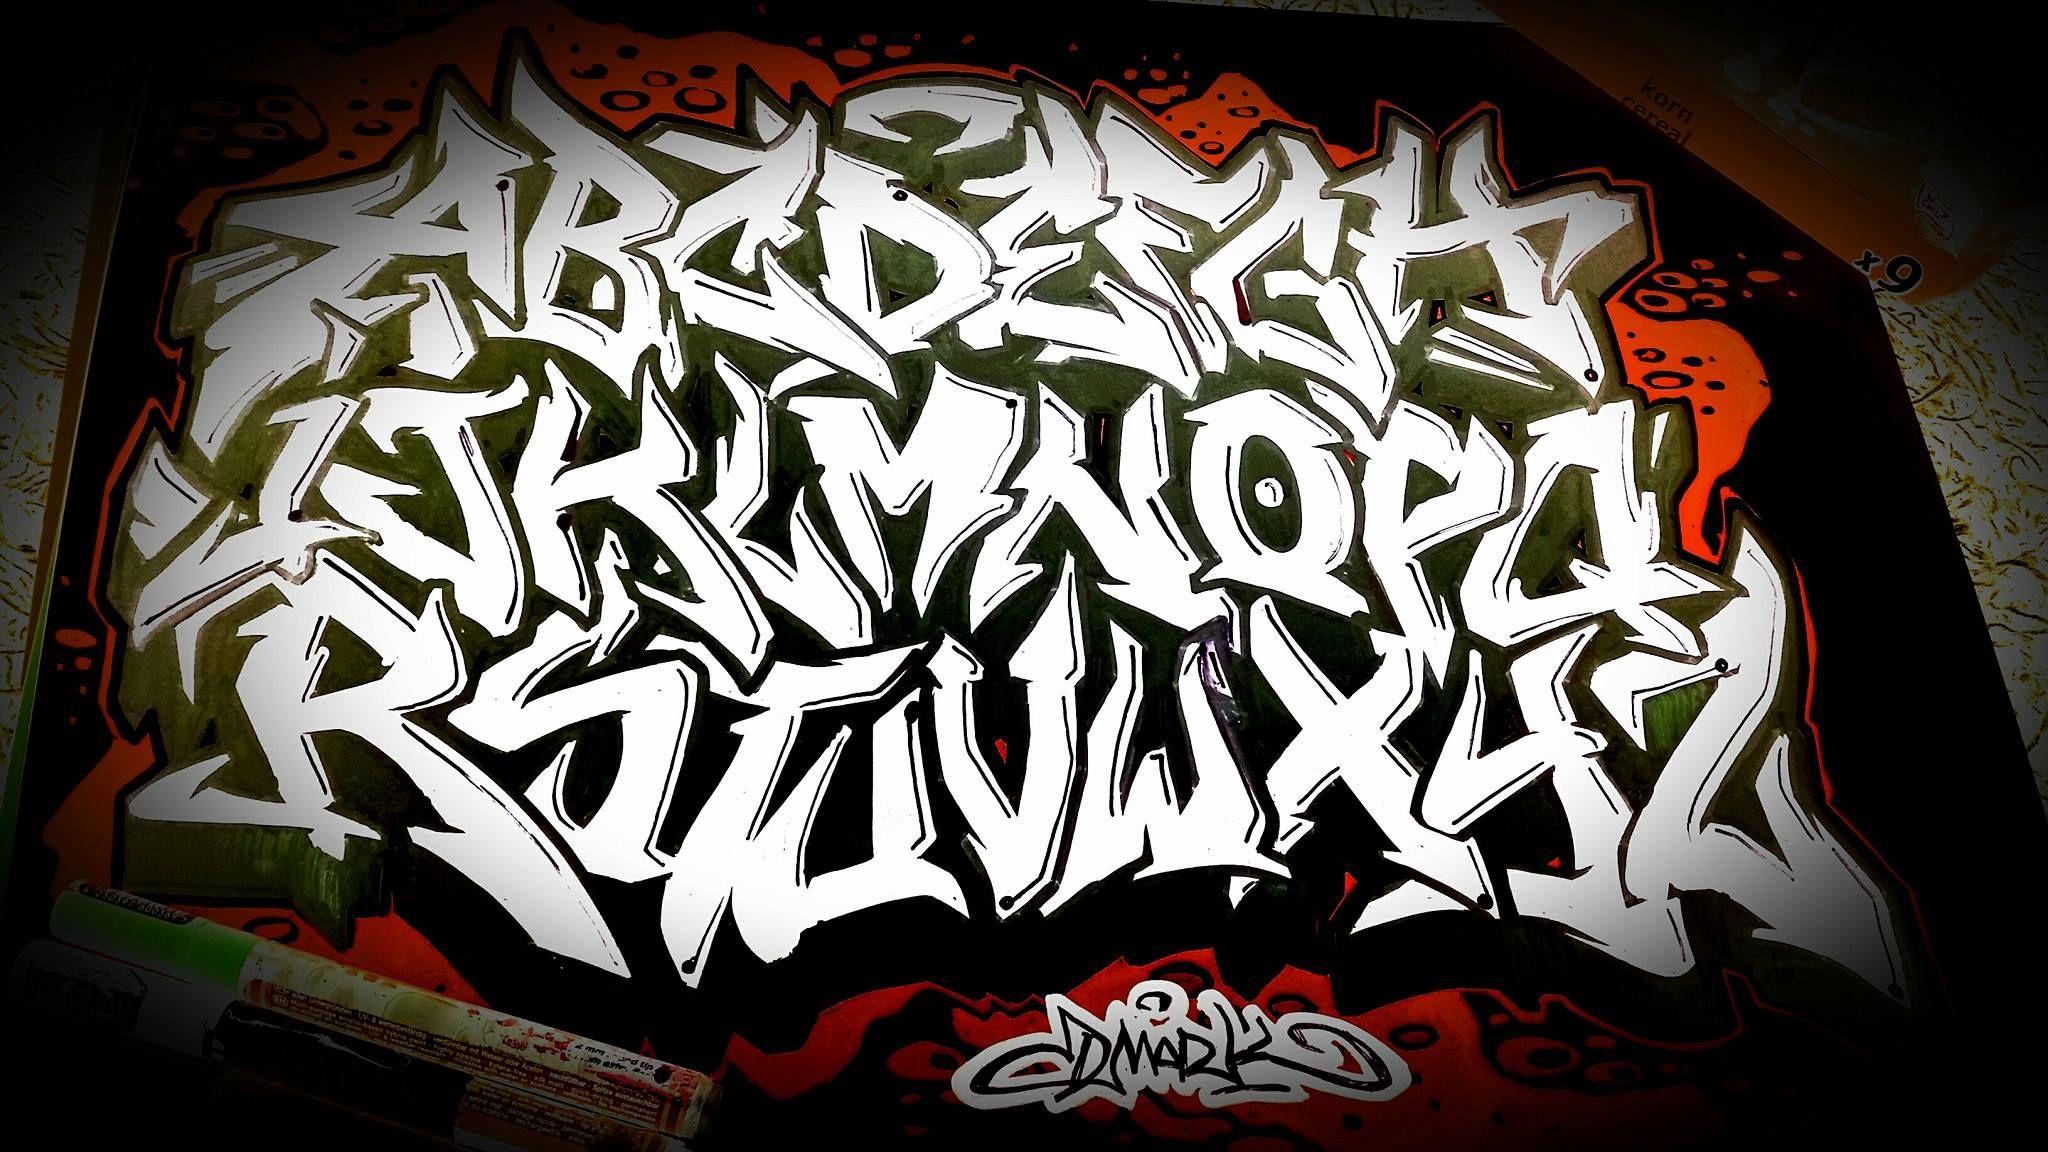 Dmark Grafitti Alphabet Graffiti Lettering Alphabet Font Alphabet Alphabet Style Chicano Lettering